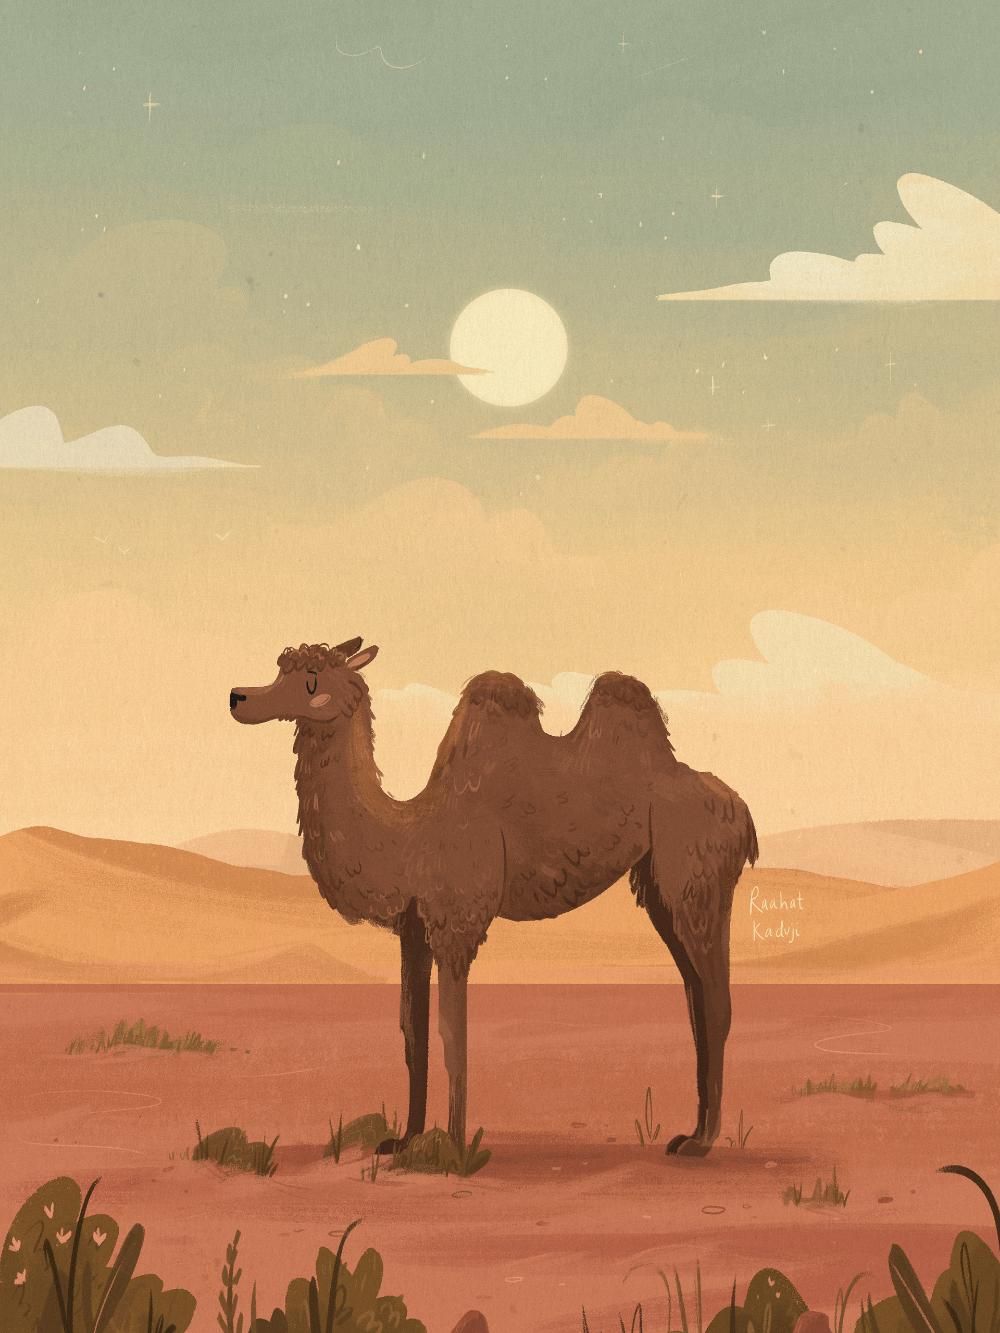 Pin by hazy on 插画艺术 Desert animals, Illustration, Animal